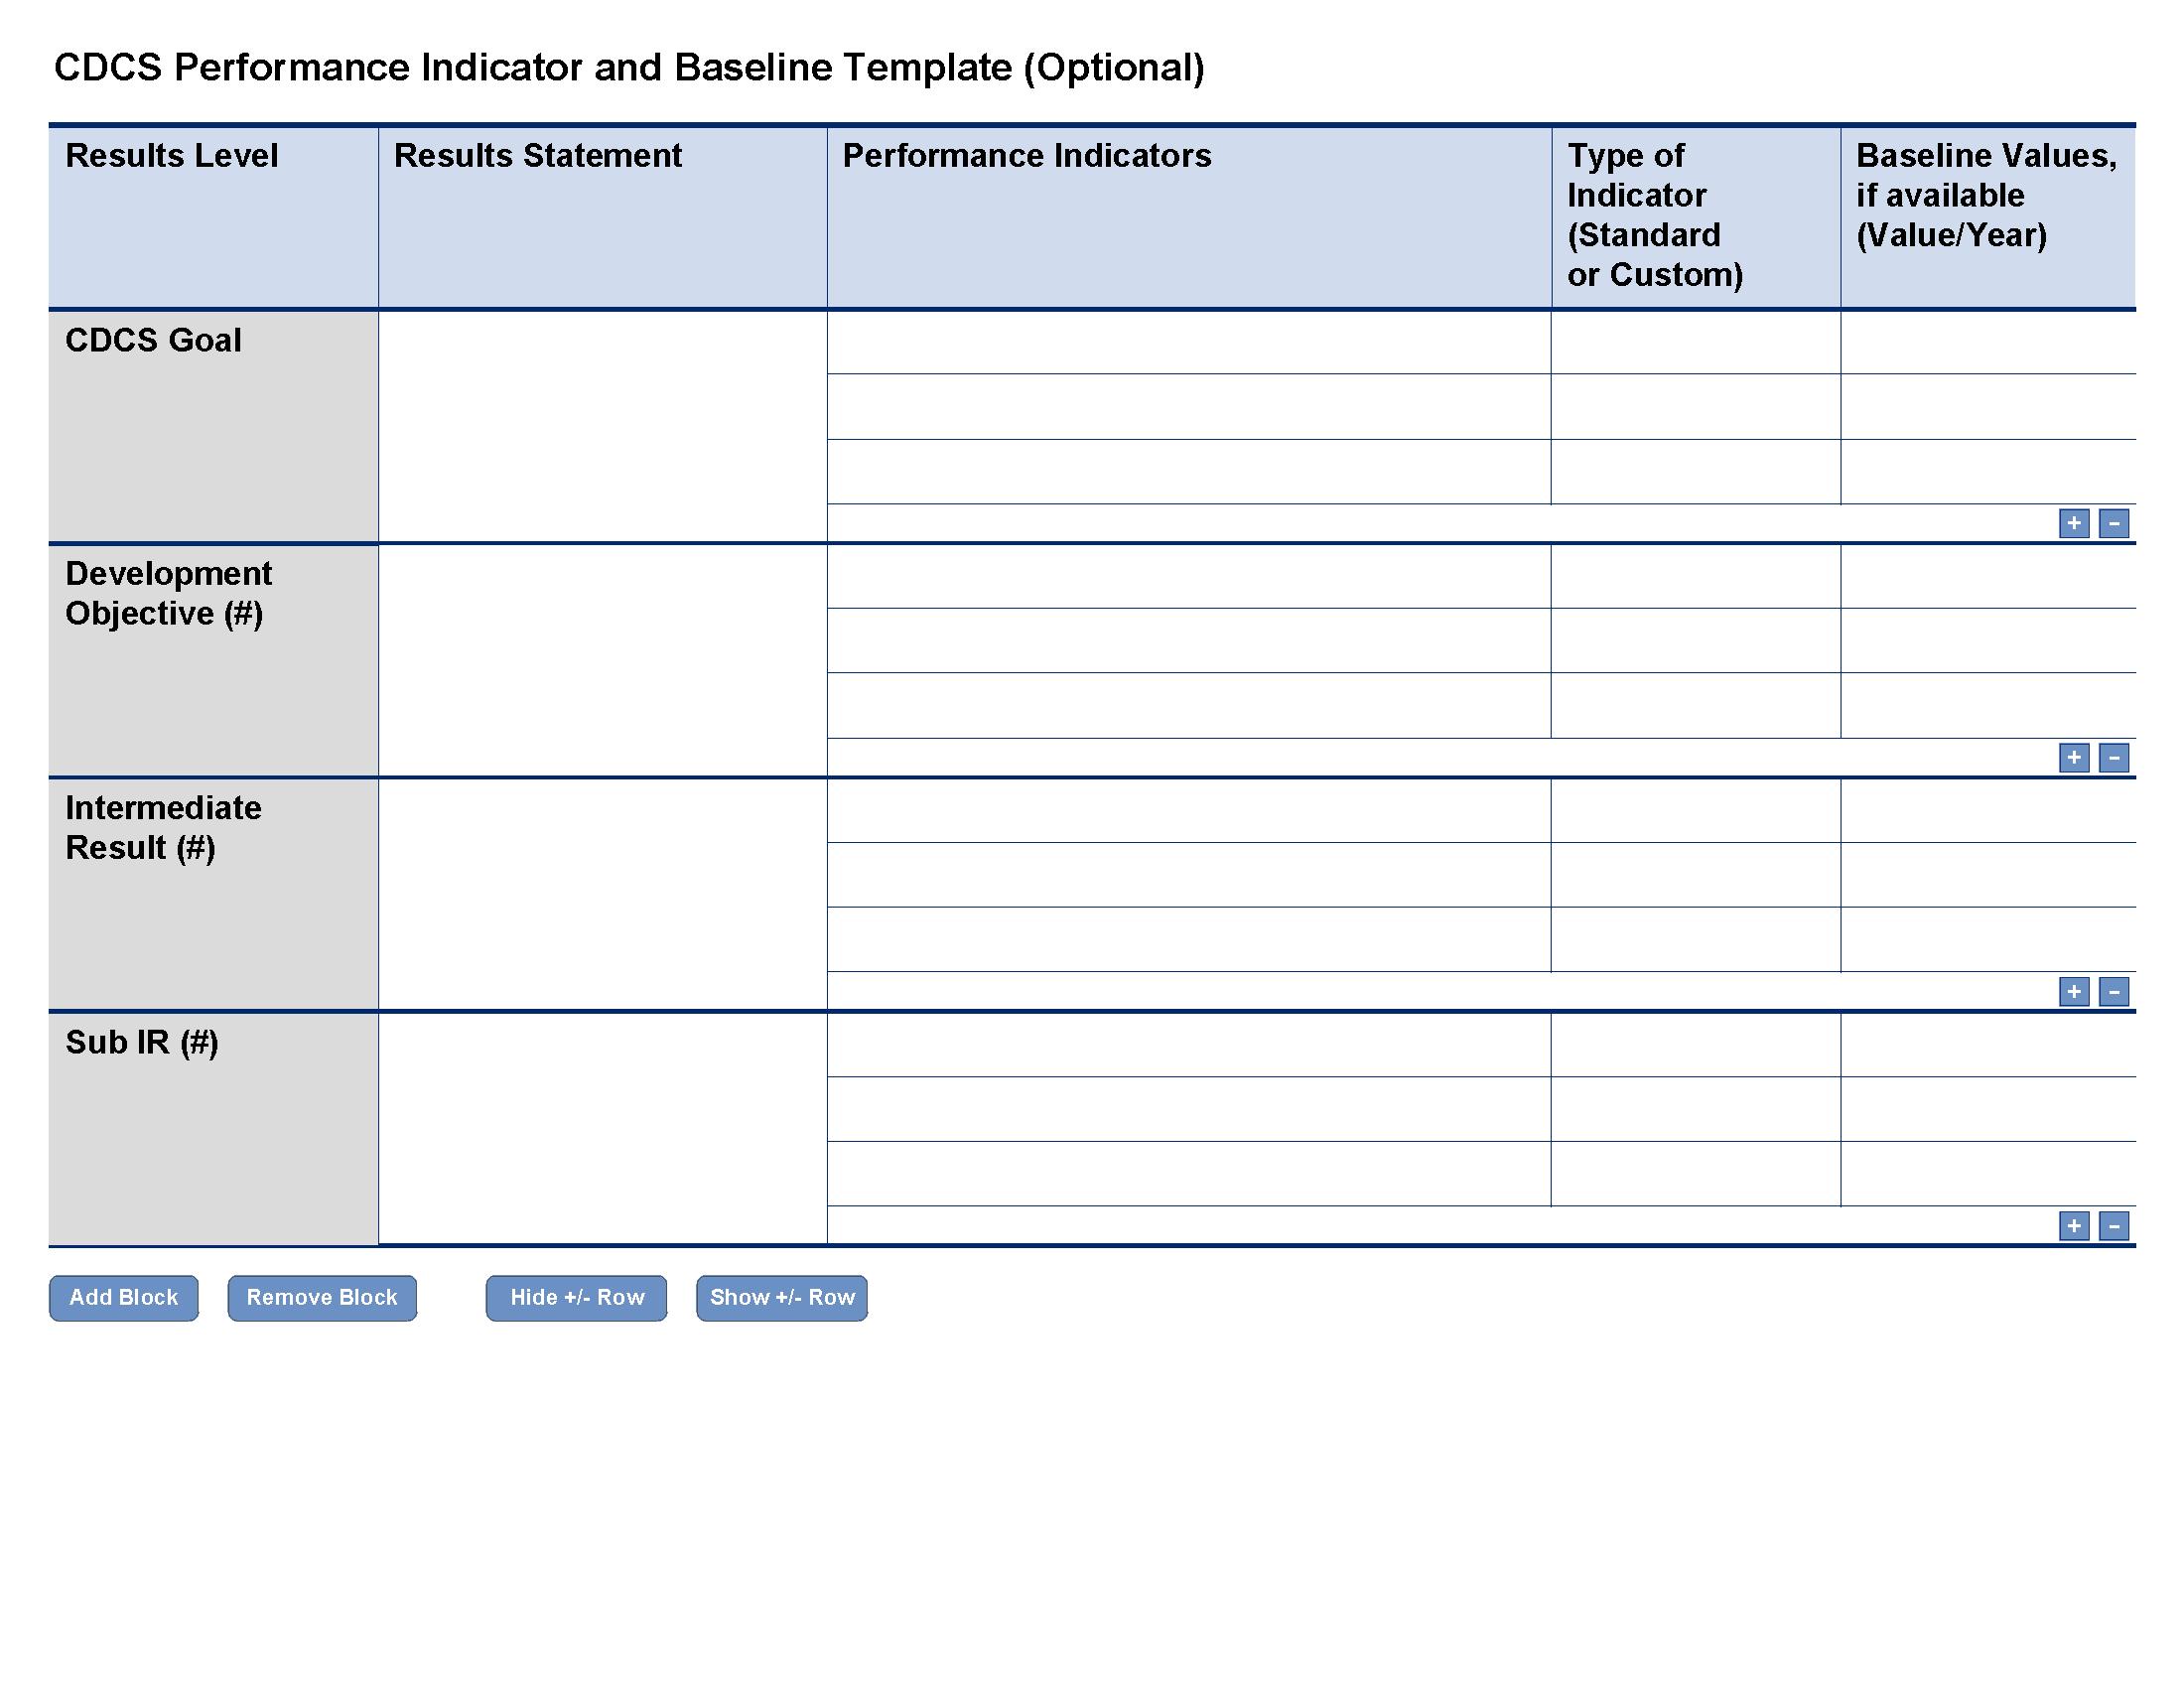 CDCS Performance Indicator and Baseline Template (Optional